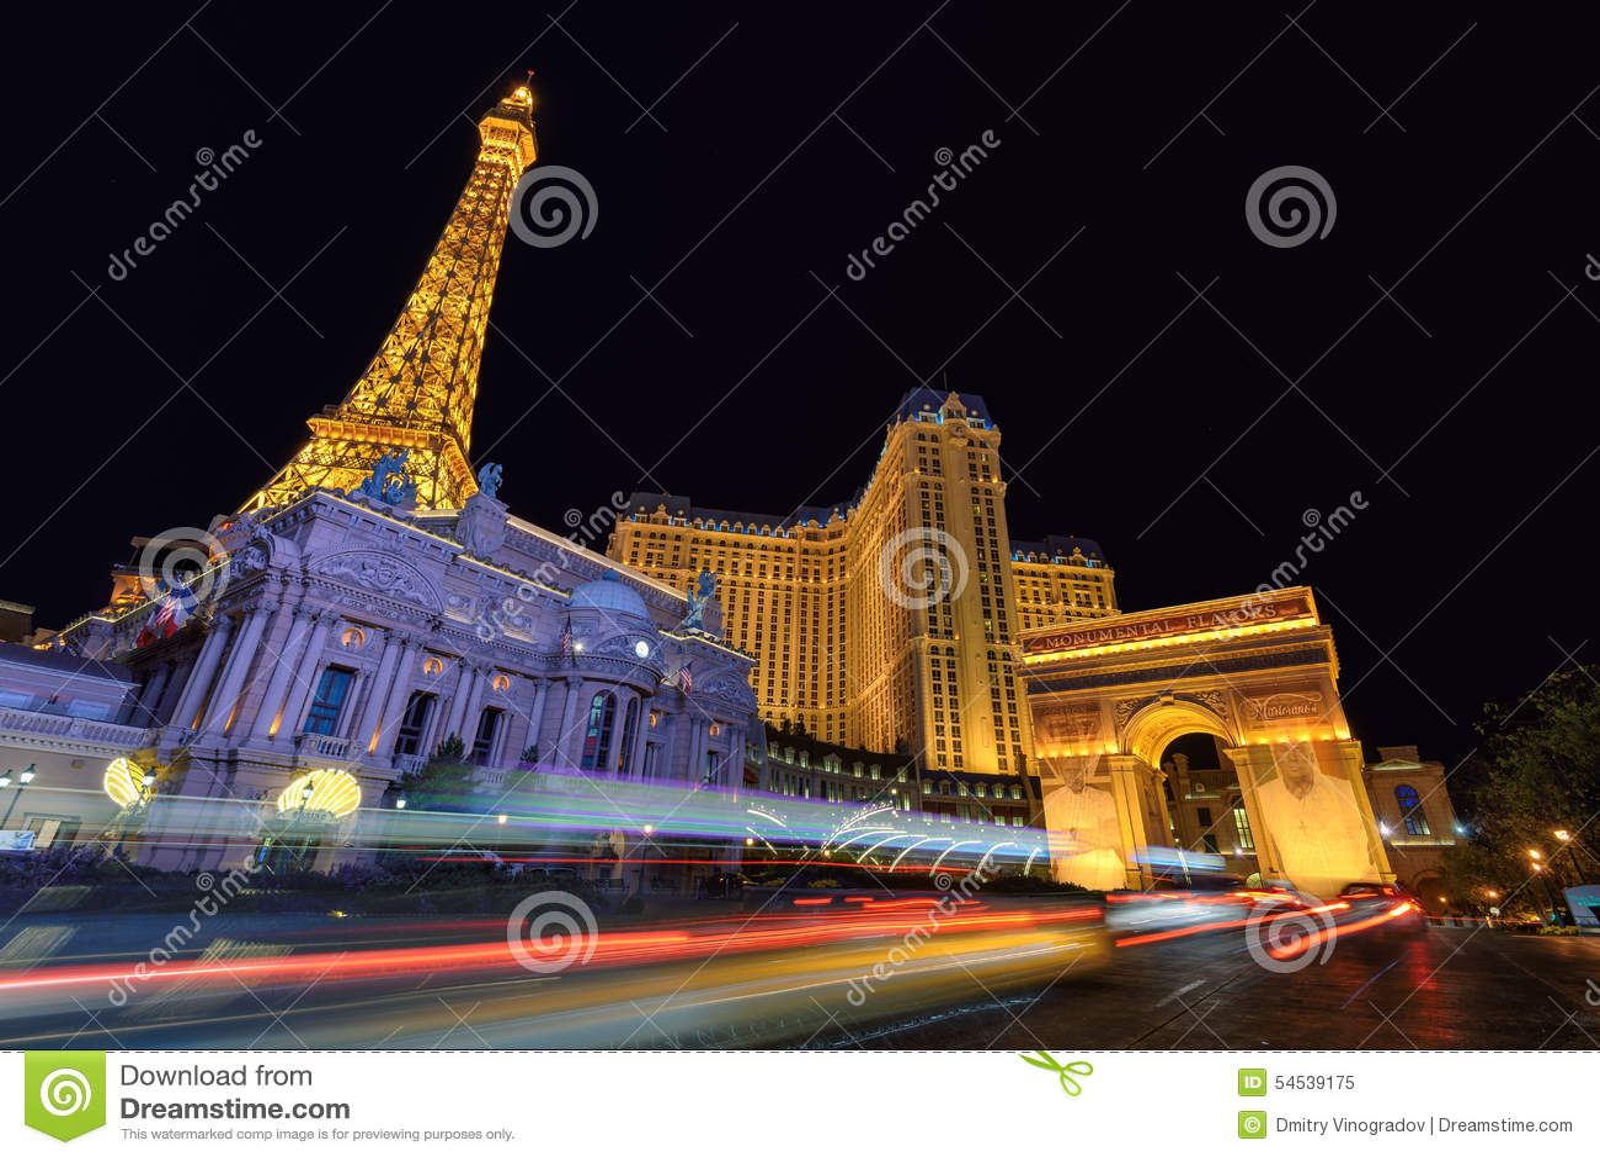 las vegas nv circa march 2015 eiffel tower and paris hotel night illumination in las vegas. Black Bedroom Furniture Sets. Home Design Ideas